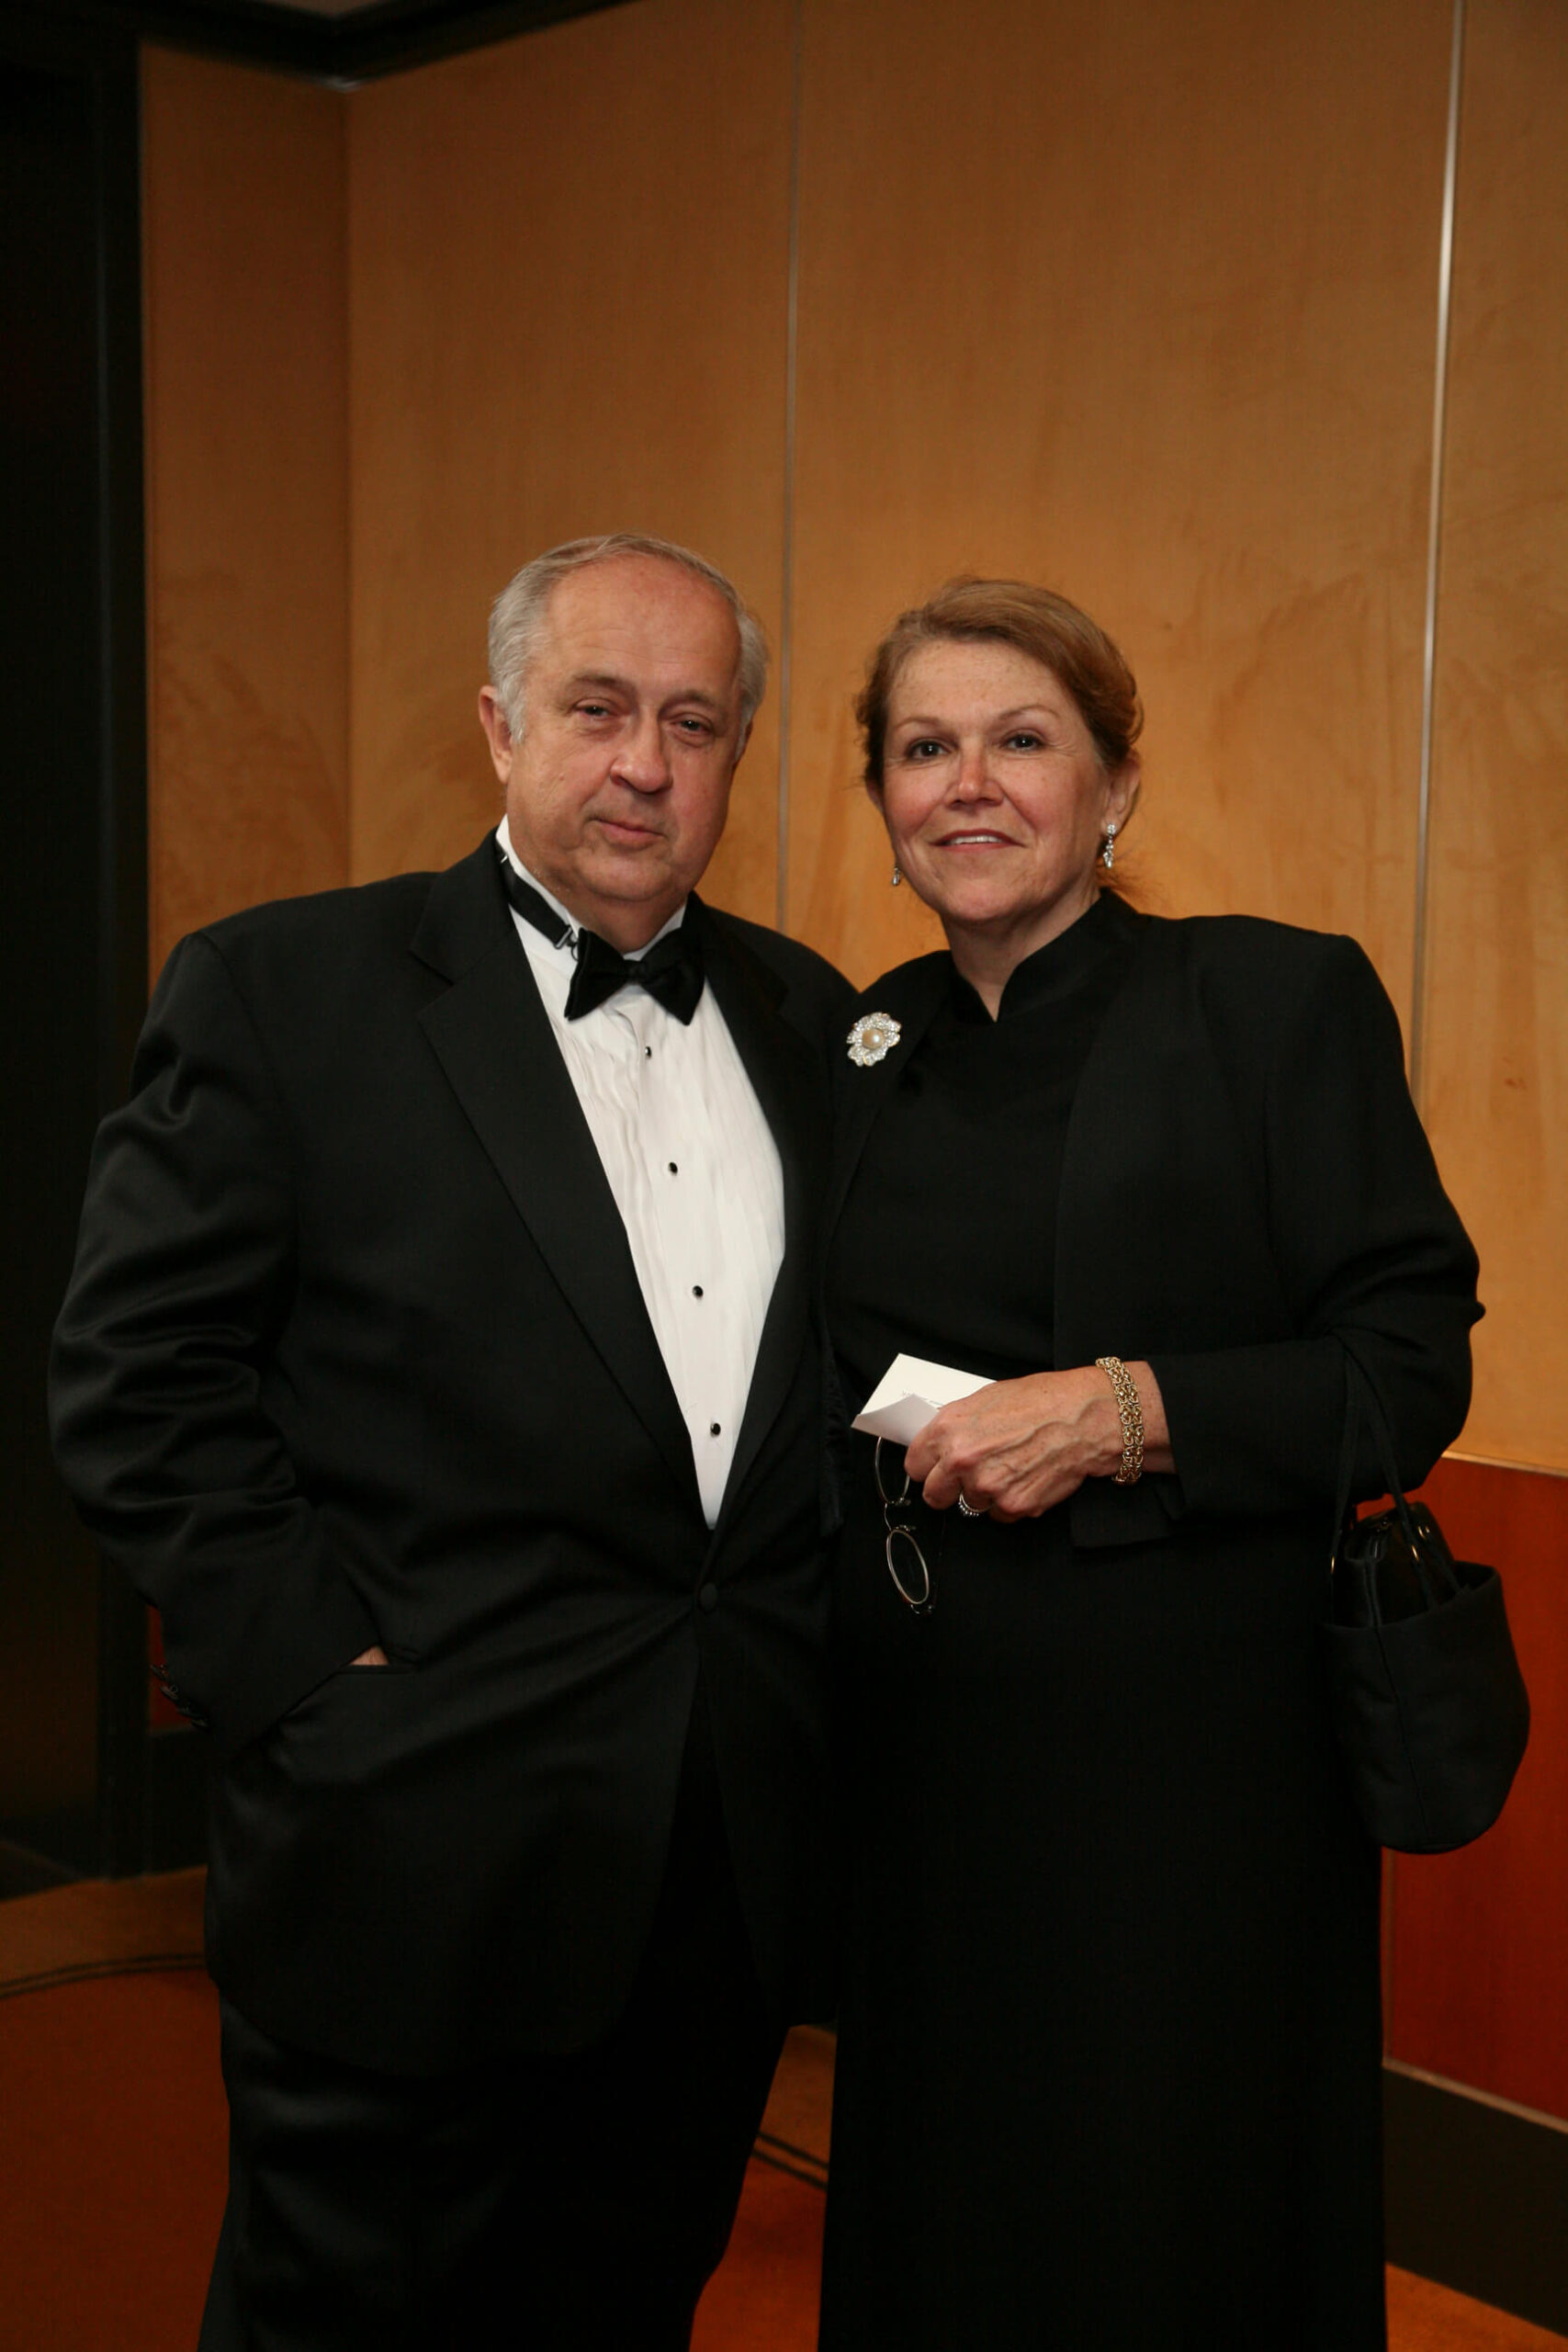 Mr. Charles Vamossy and Ms. Barbara Vamossy